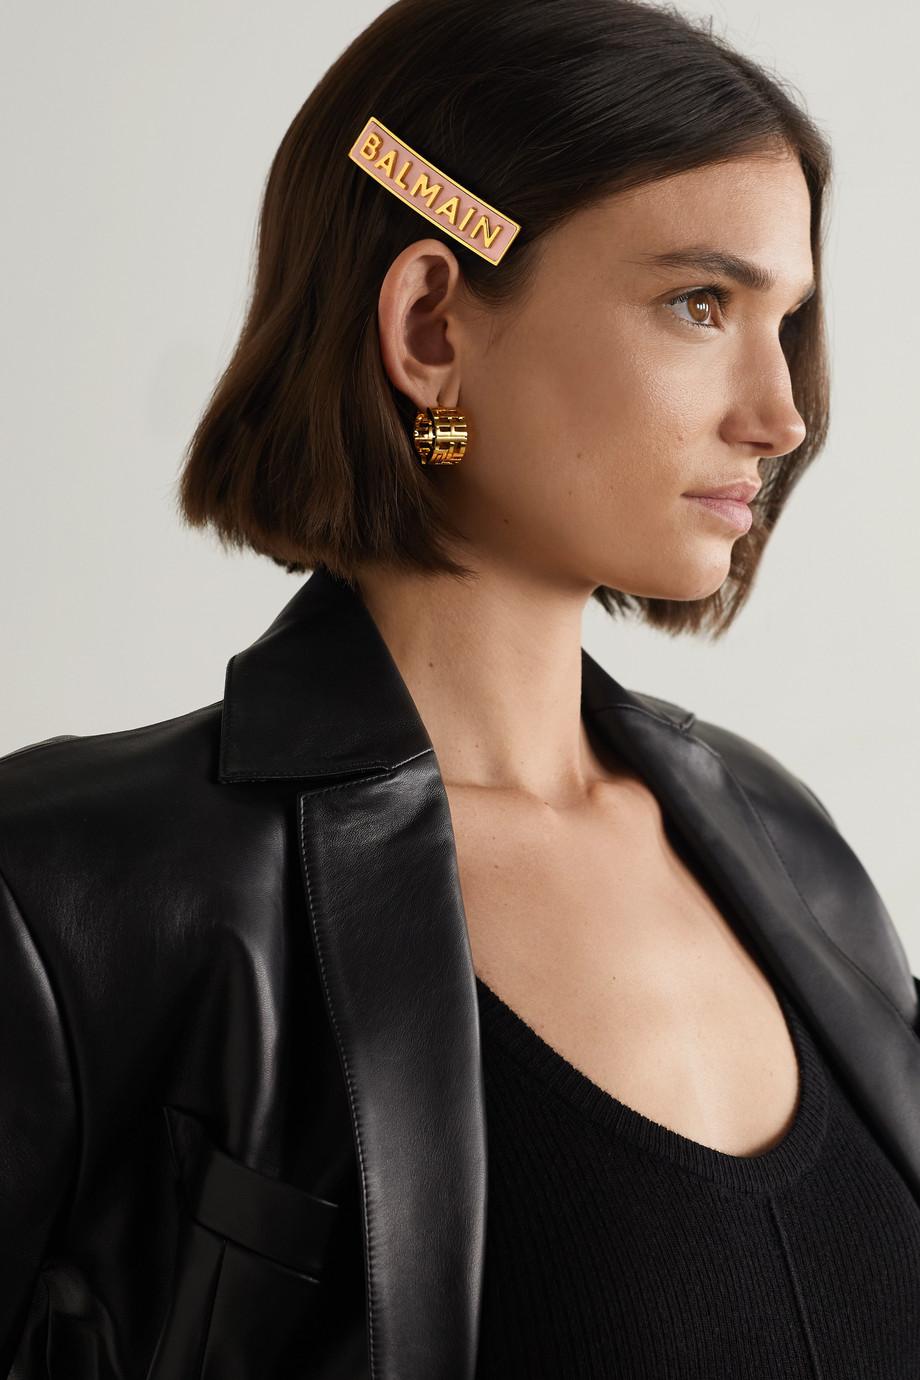 Balmain Paris Hair Couture Vergoldete Haarspange mit Leder